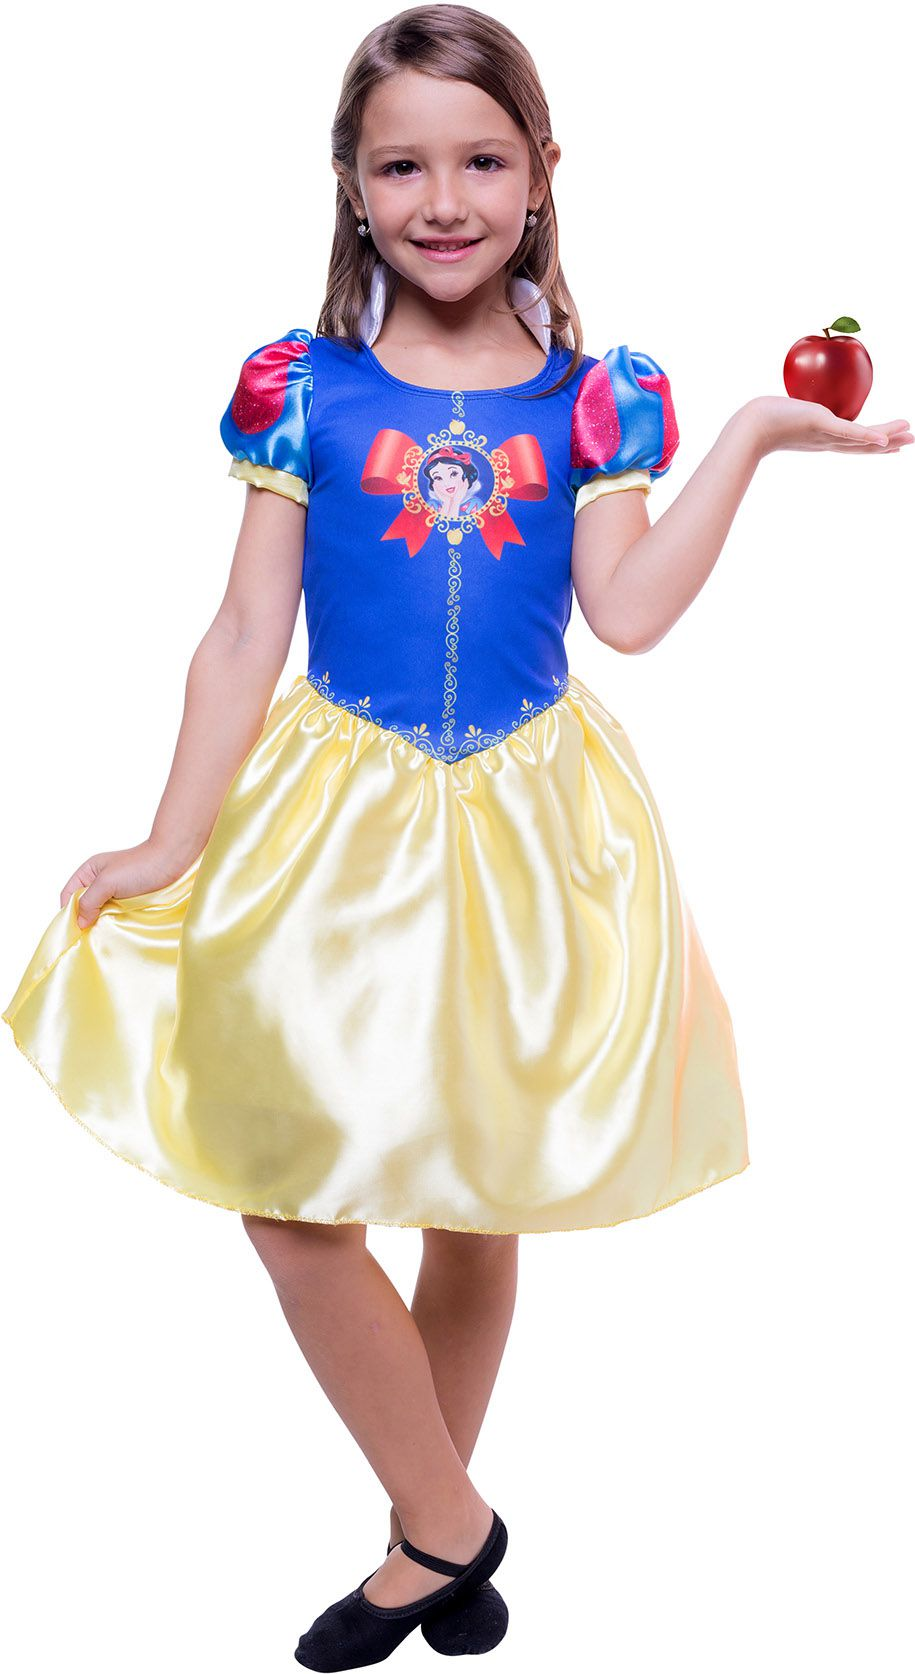 45b0bfd78 Fantasia Branca de Neve Infantil Princesas Disney - SUPER25